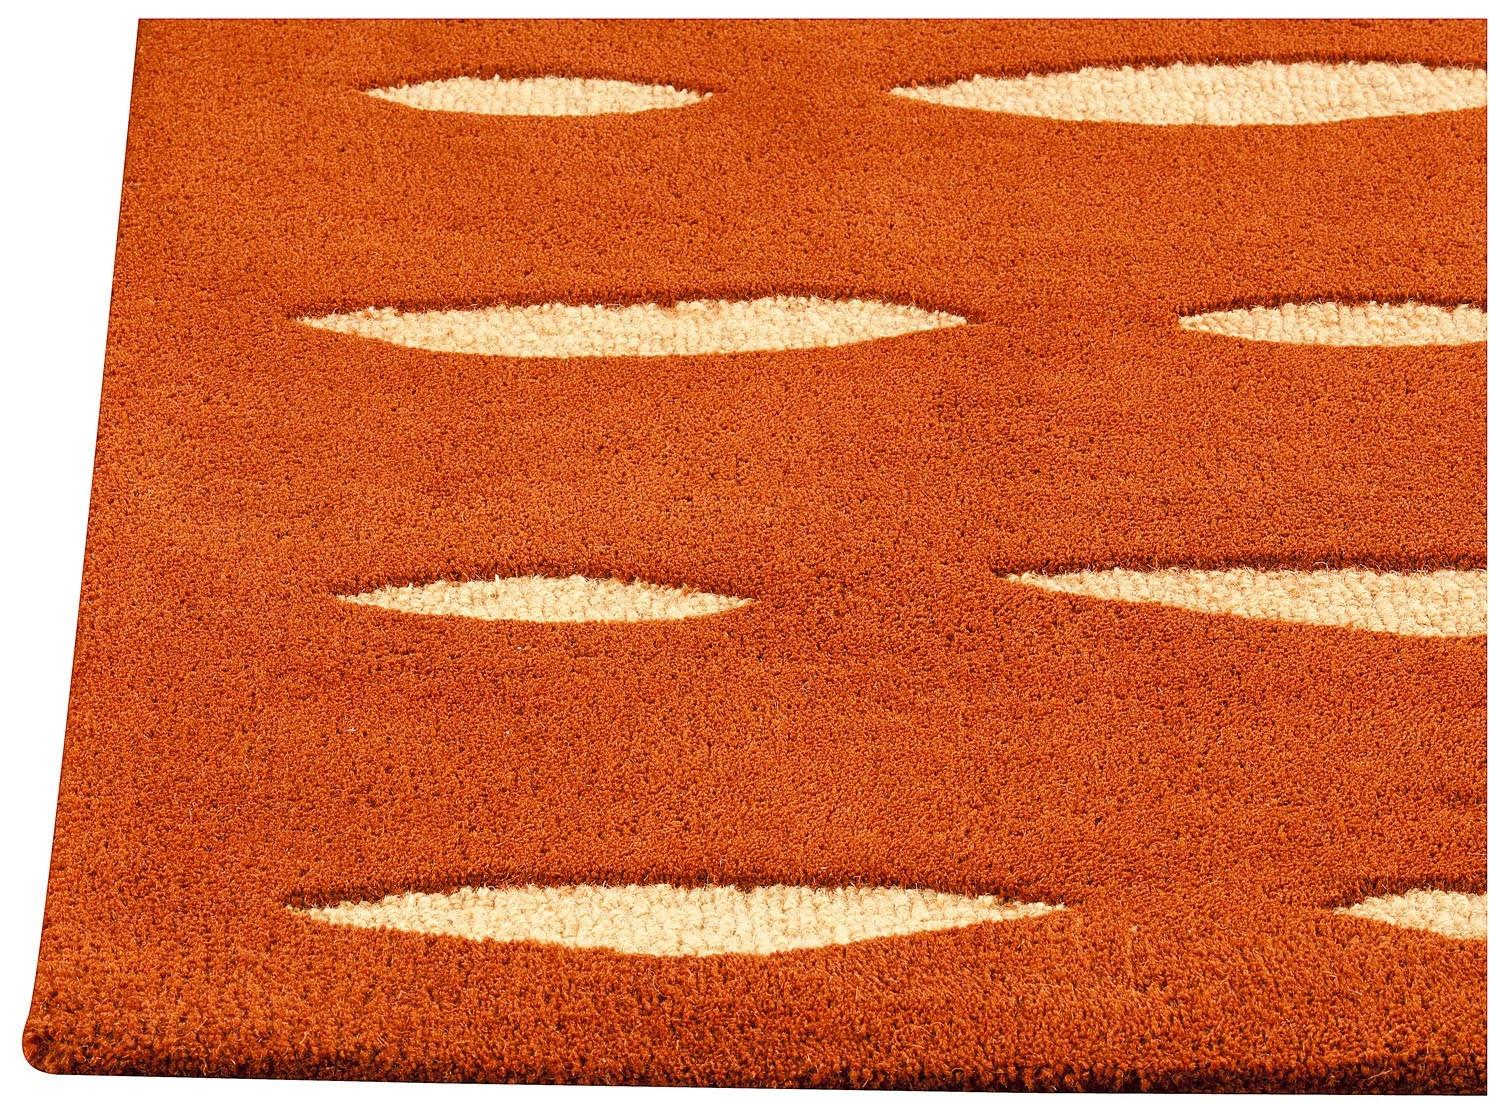 Rug Orange Area Rug 810 Wuqiangco Throughout Orange Floor Rugs (View 8 of 15)